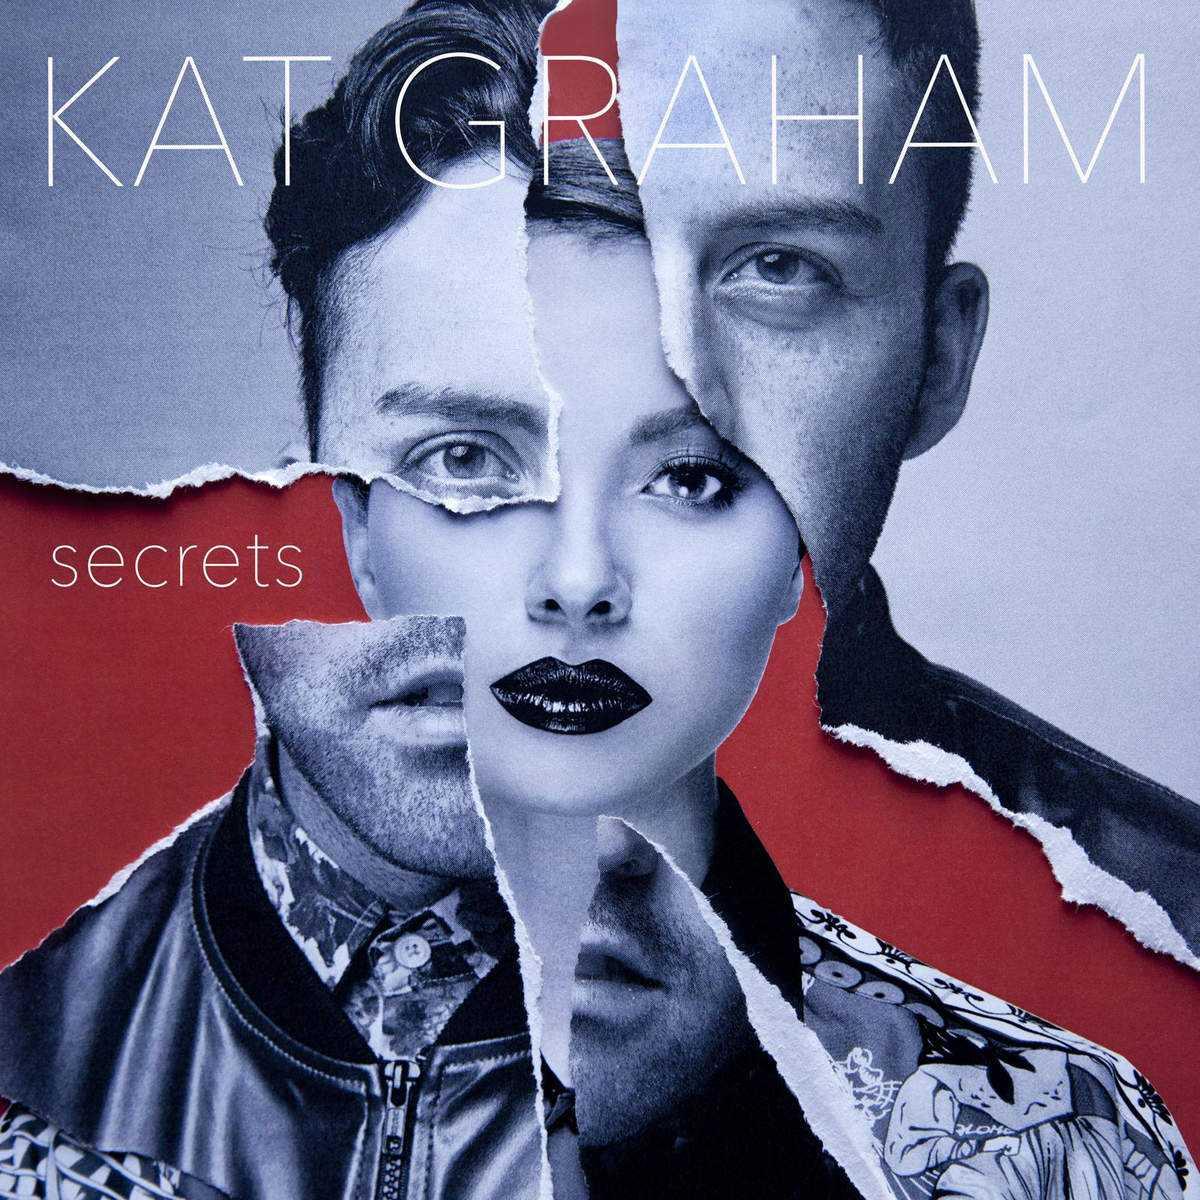 Kat Graham Enlists Babyface For New Single, Secrets | Kat Graham